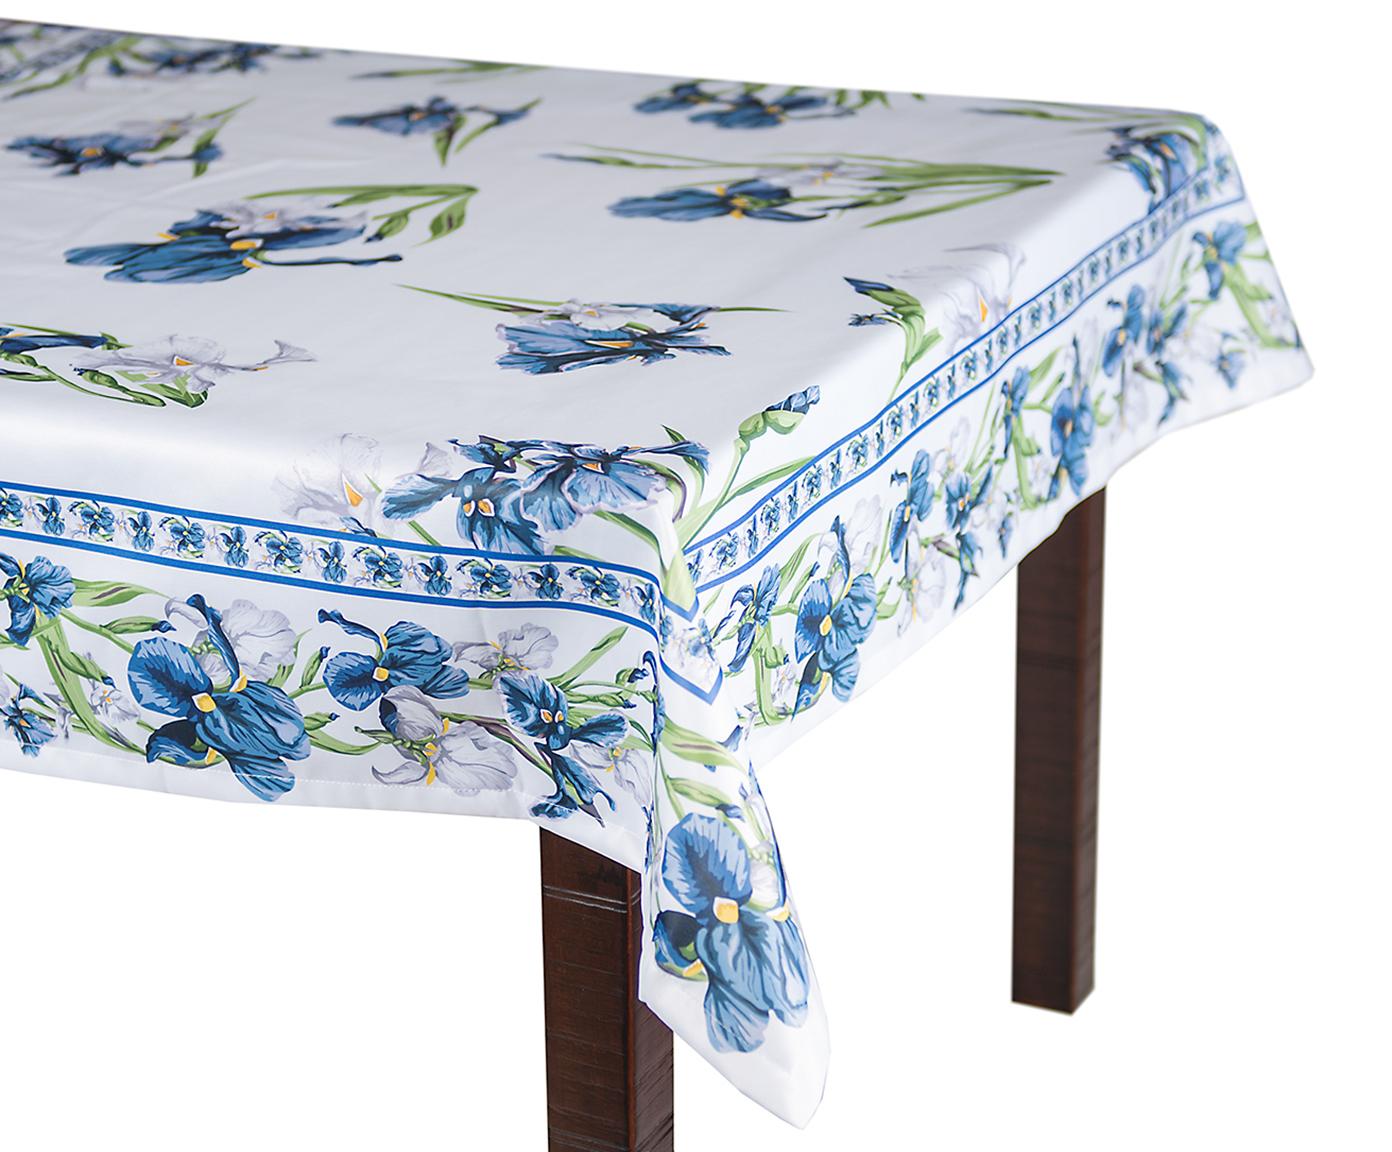 Кухня Скатерть 260x140 Blonder Home Iris синяя skatert-140x140-blonder-home-iris-sinyaya-ssha-rossiya.jpg